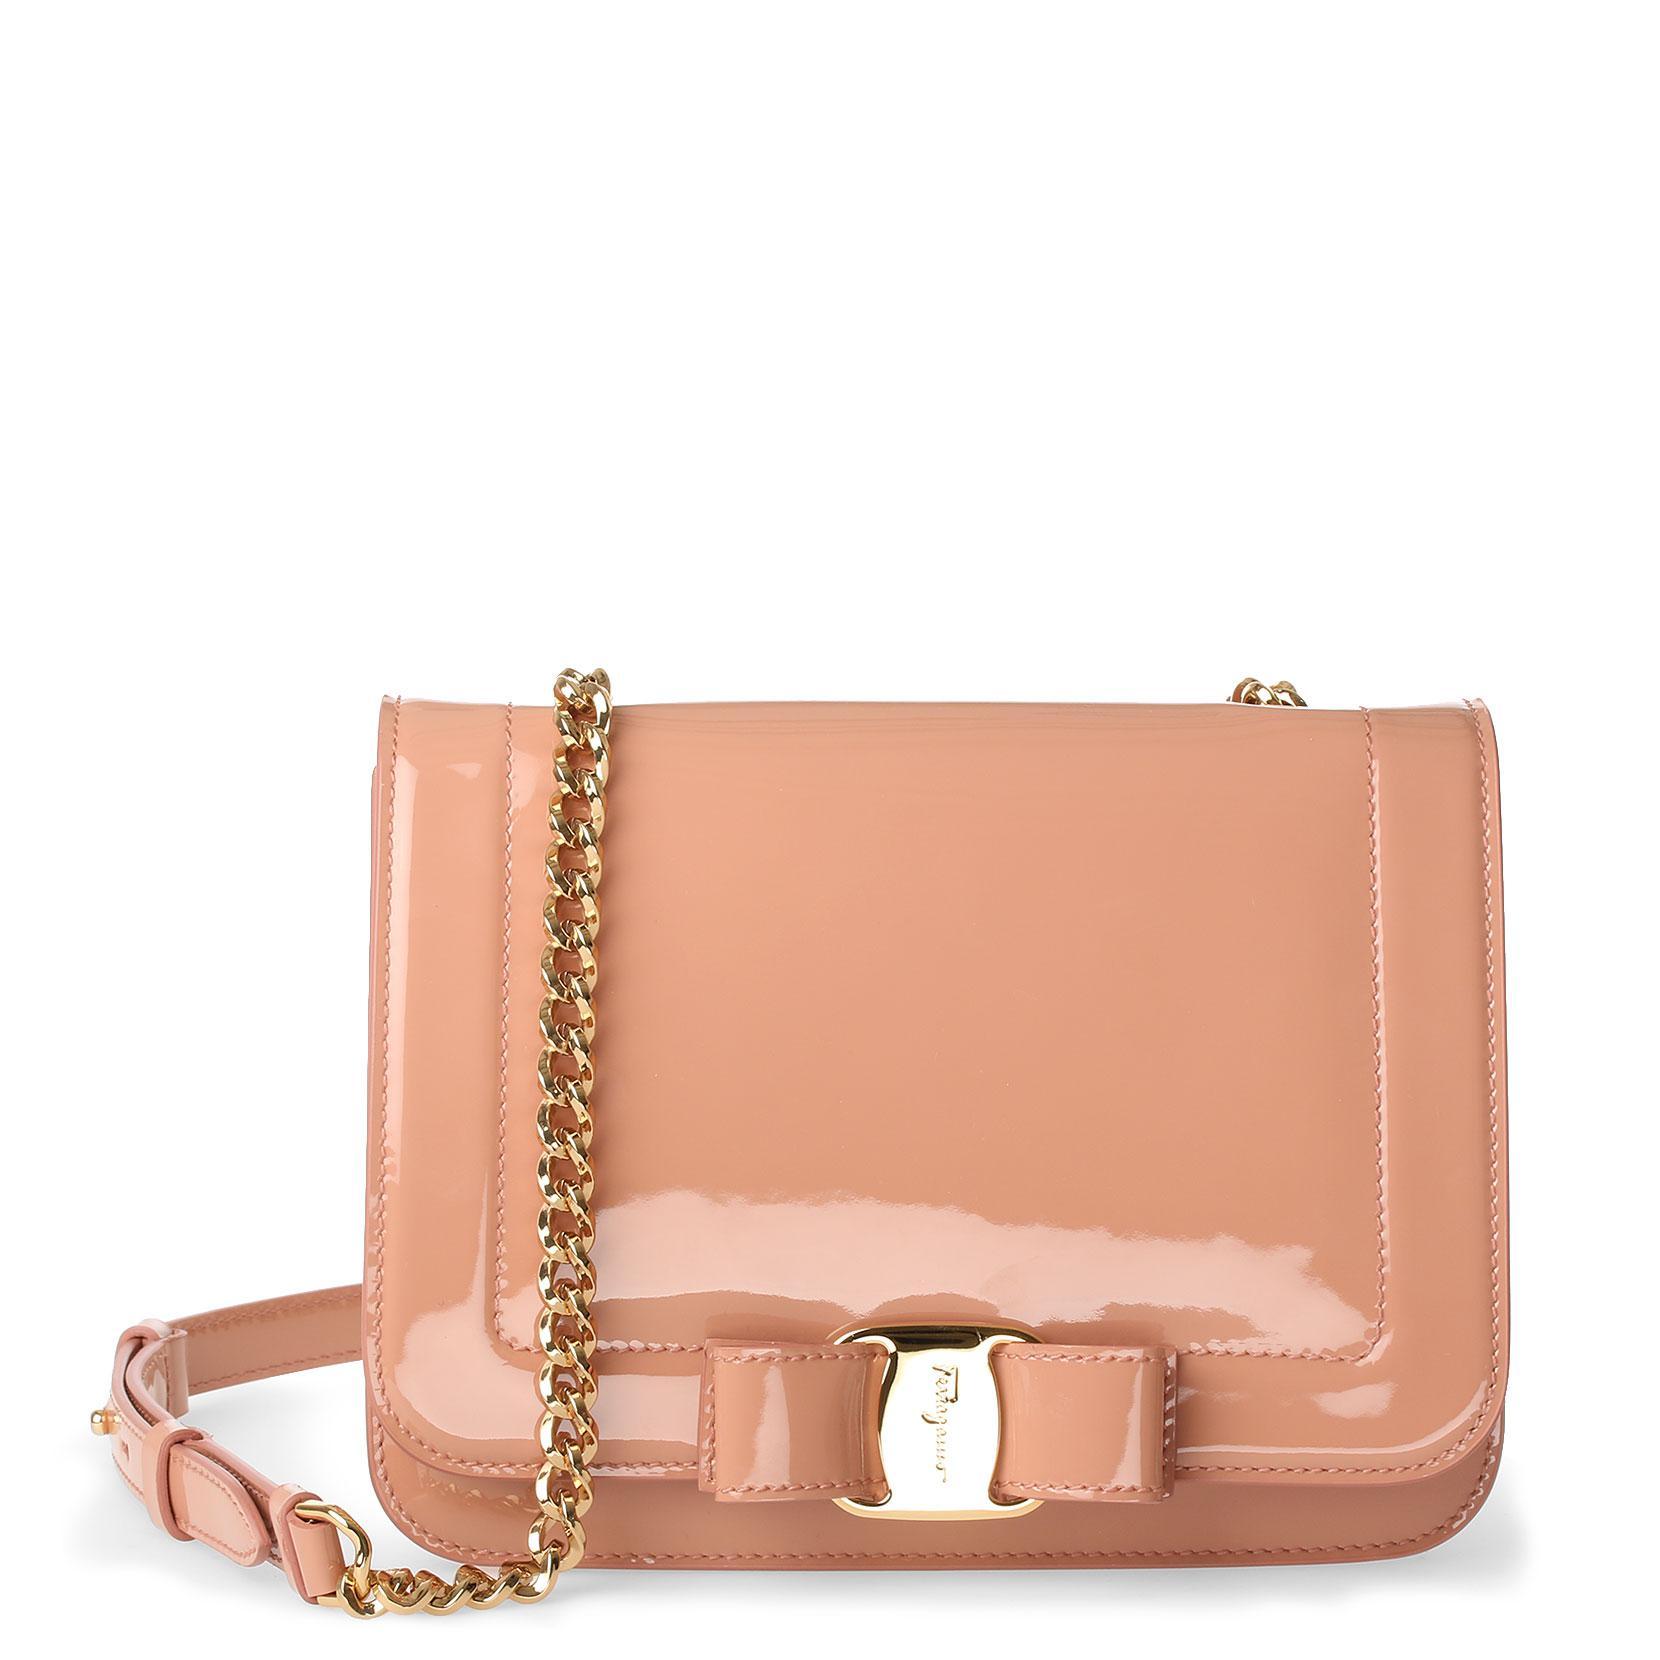 Salvatore Ferragamo Vara nude patent leather shoudler bag y5boDNGuVL